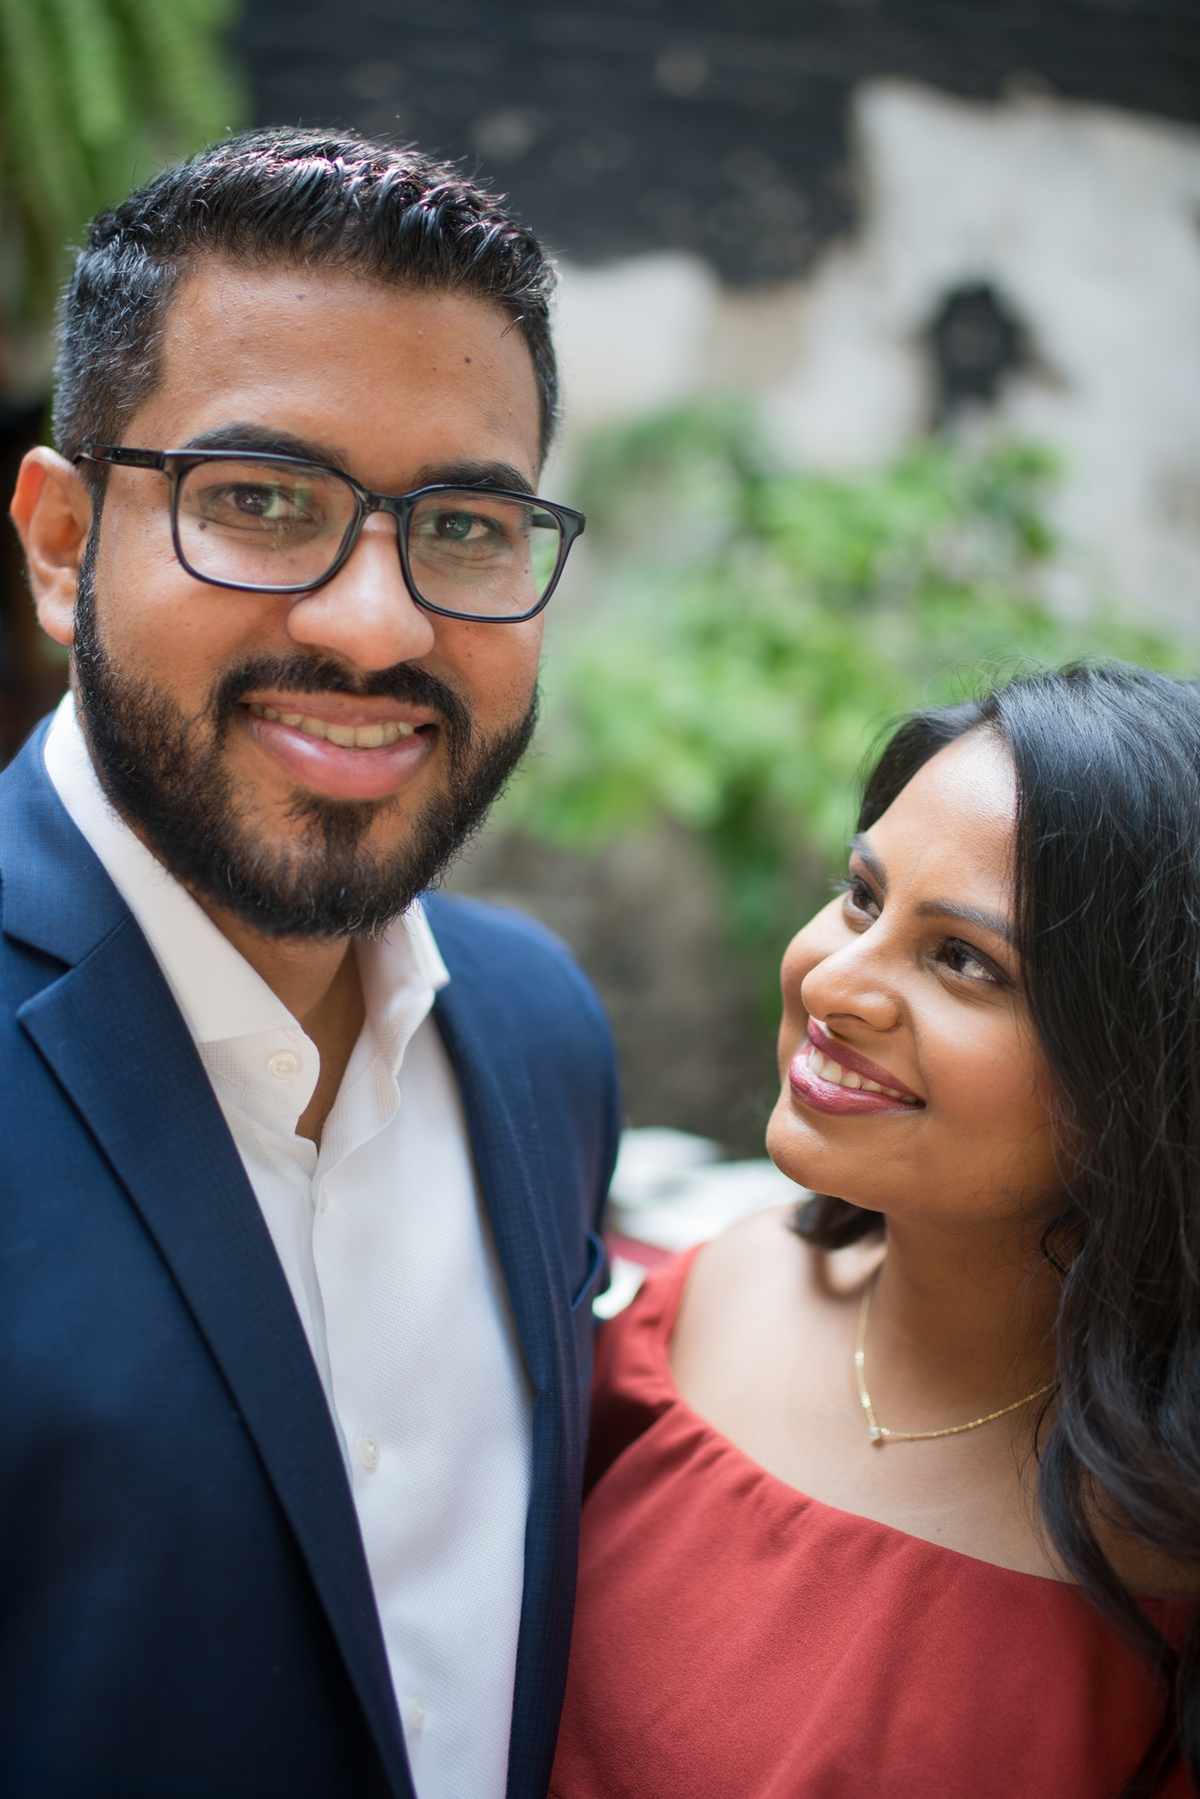 Le Cape Weddings - Sindhura - Chicago Engagement Session_-3.jpg